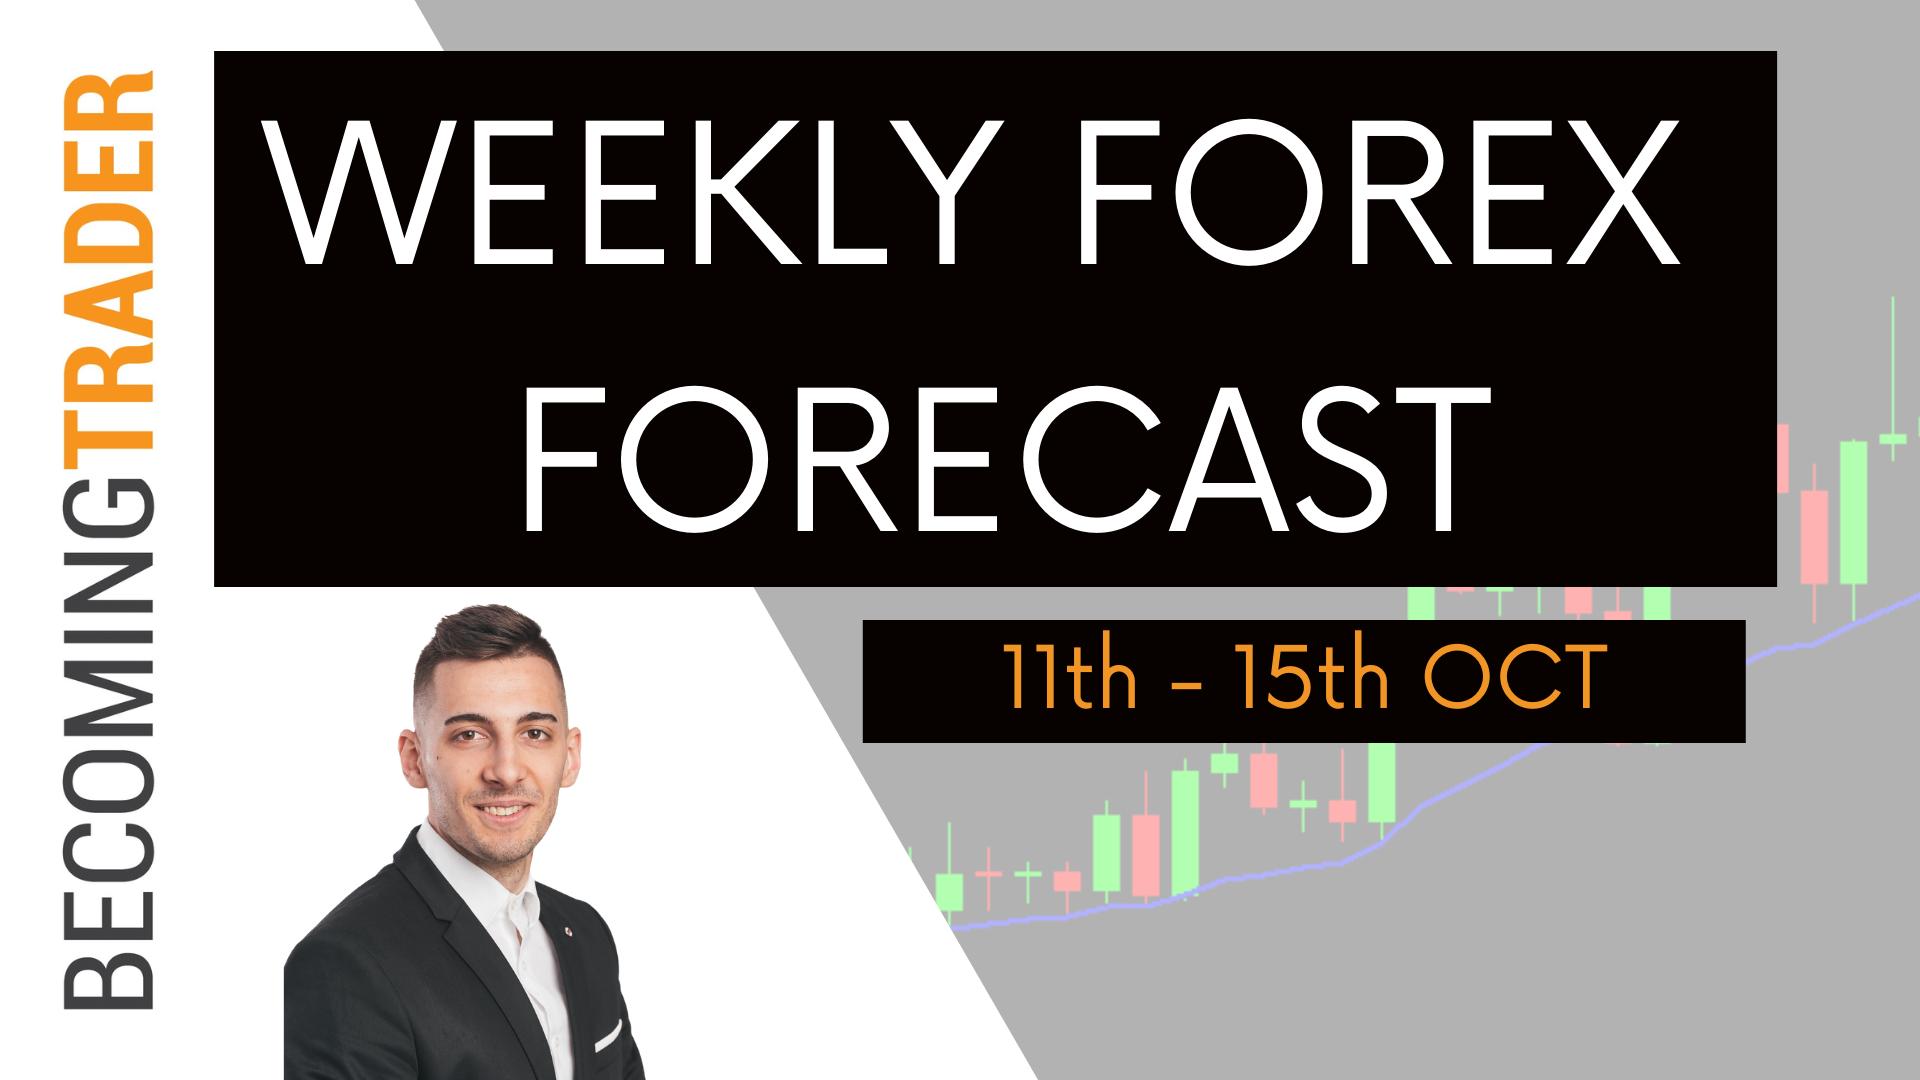 Weekly Forex Forecast 11th to 15th October 2021 | EURUSD , GBPUSD , AUDUSD , NZDUSD , USDCAD , USDJPY